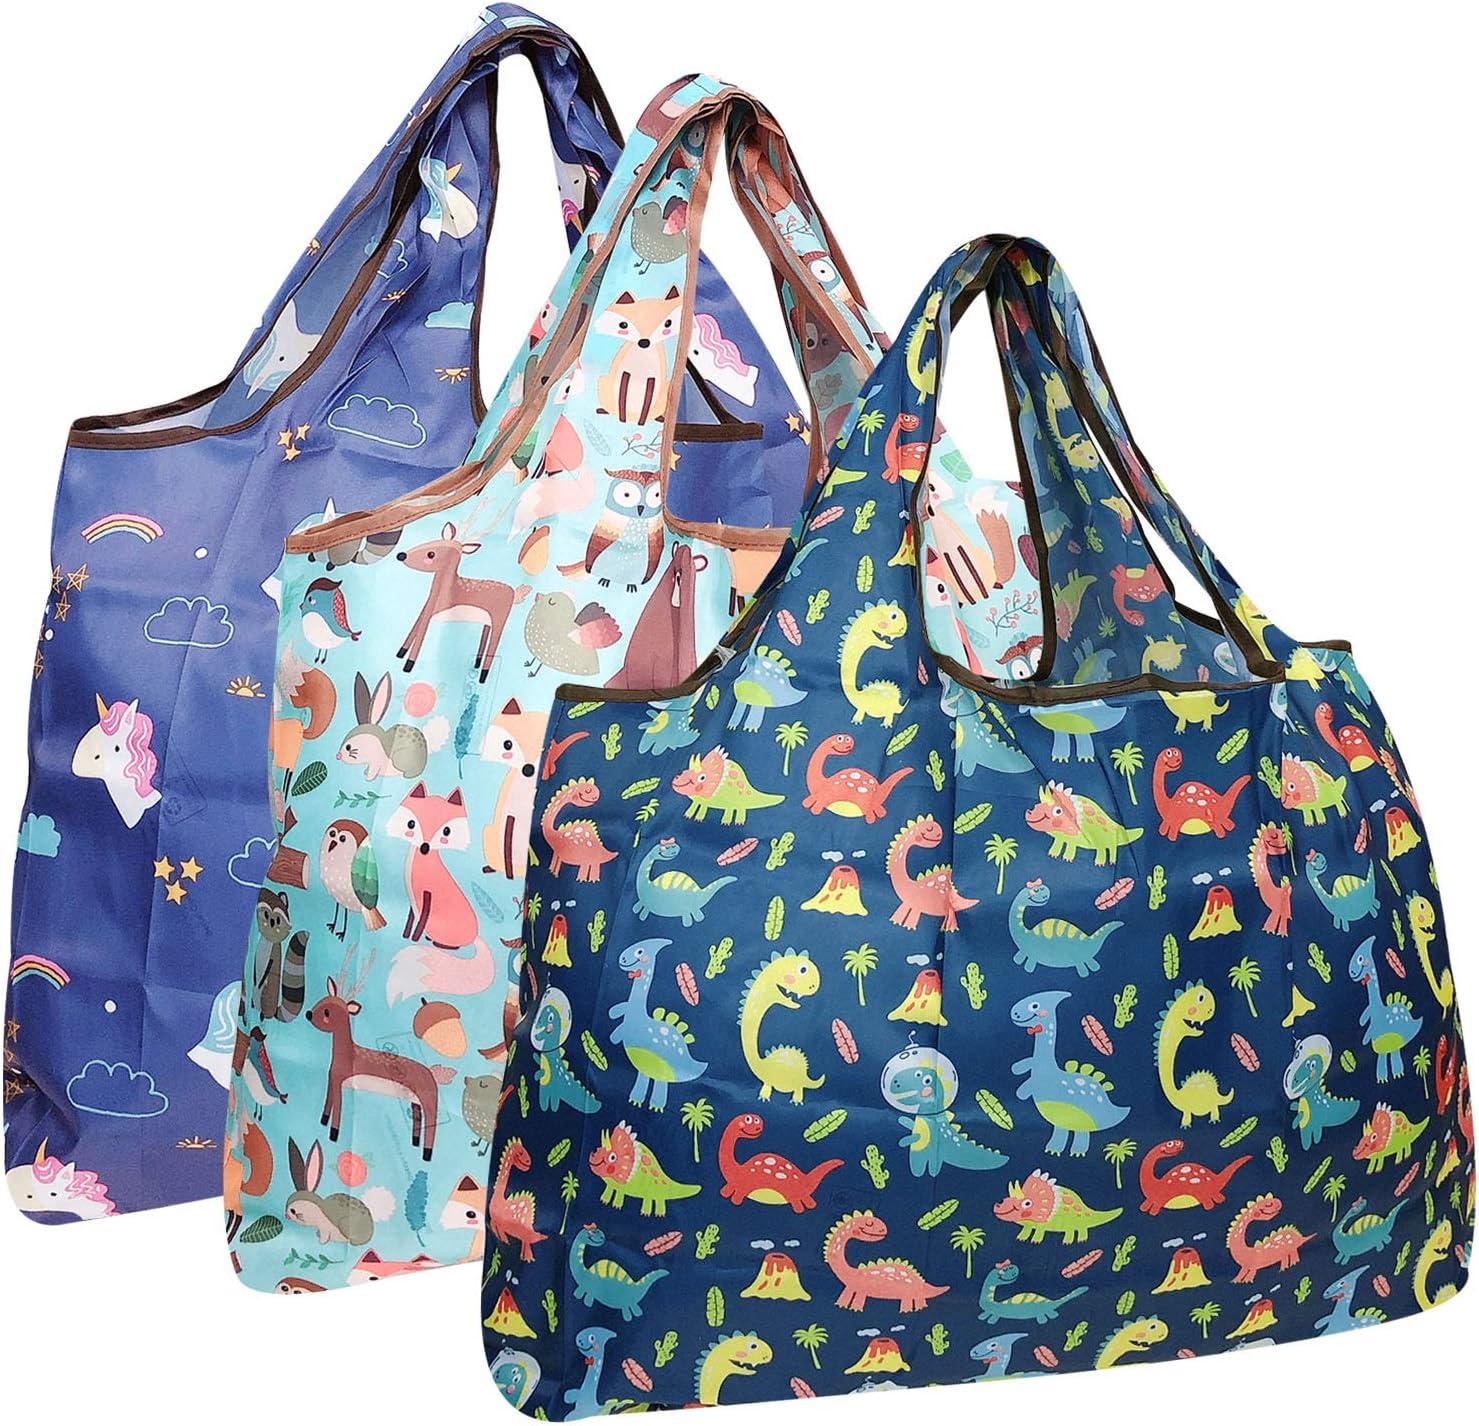 Bowbear Foldable Nylon Reusable Shopping Direct sale of manufacturer Grocery Reservation 3 Bag Set